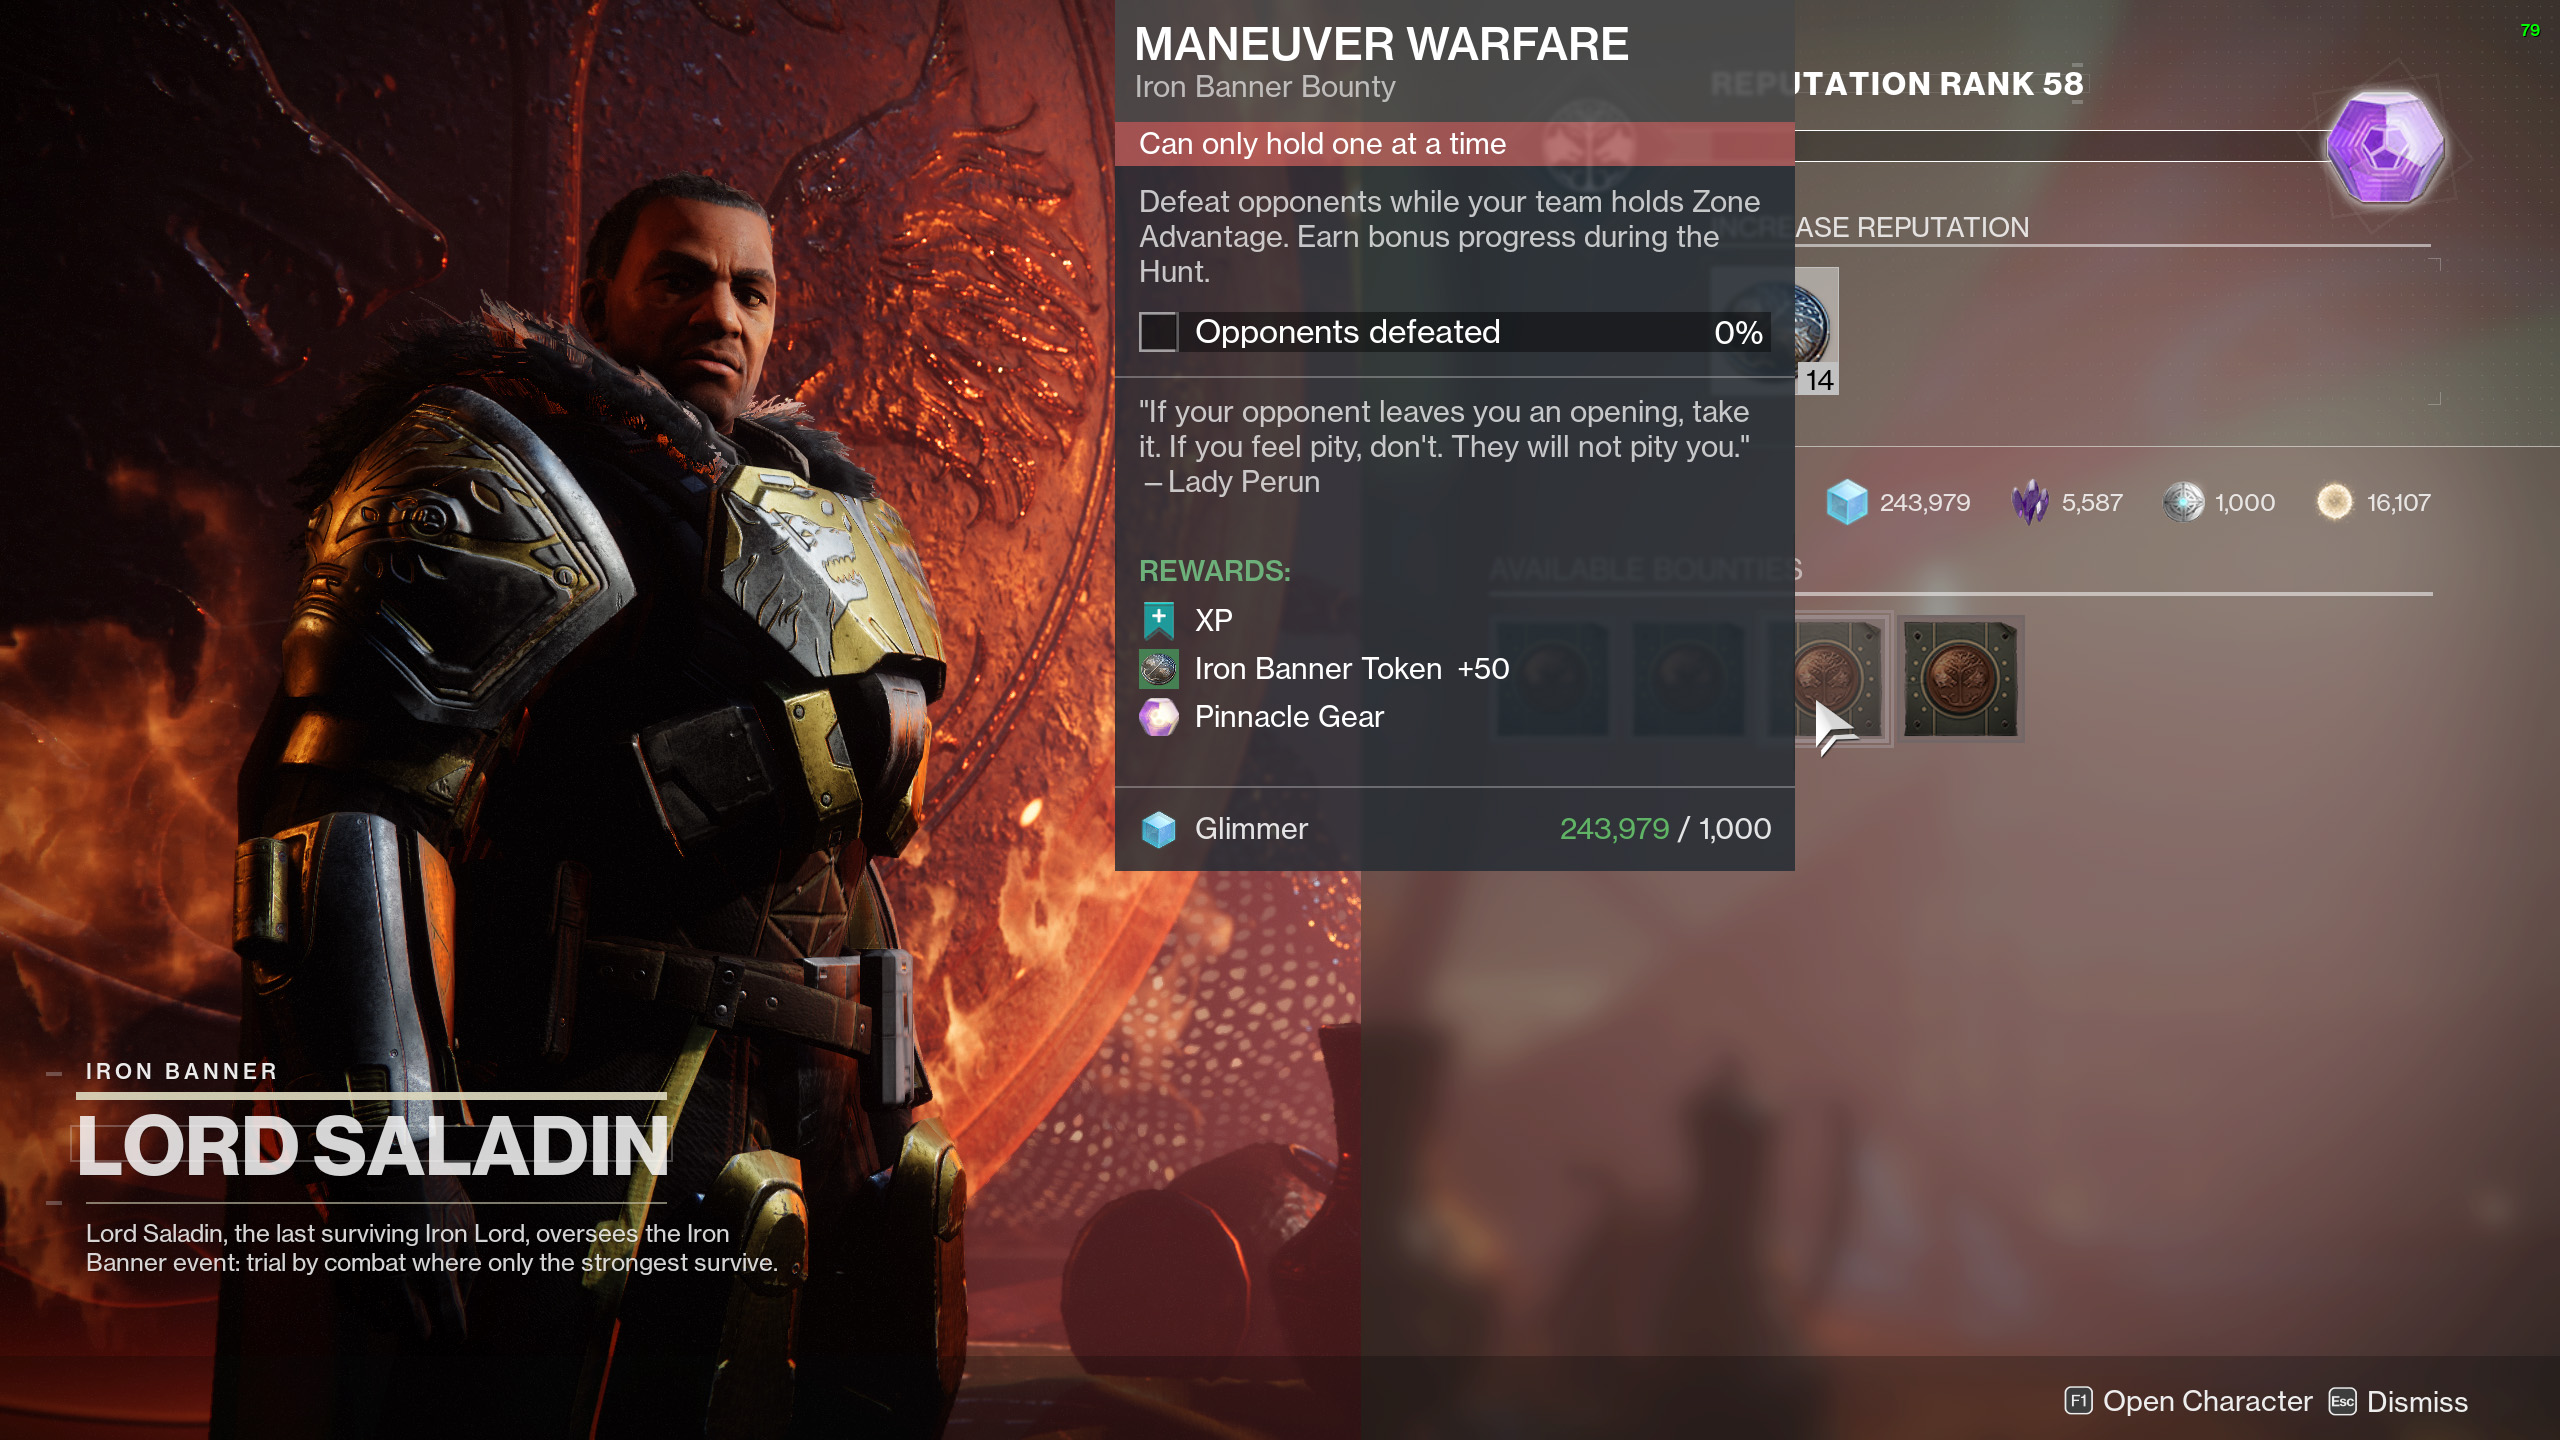 destiny 2 iron banner season 14 bounties maneuver warfare